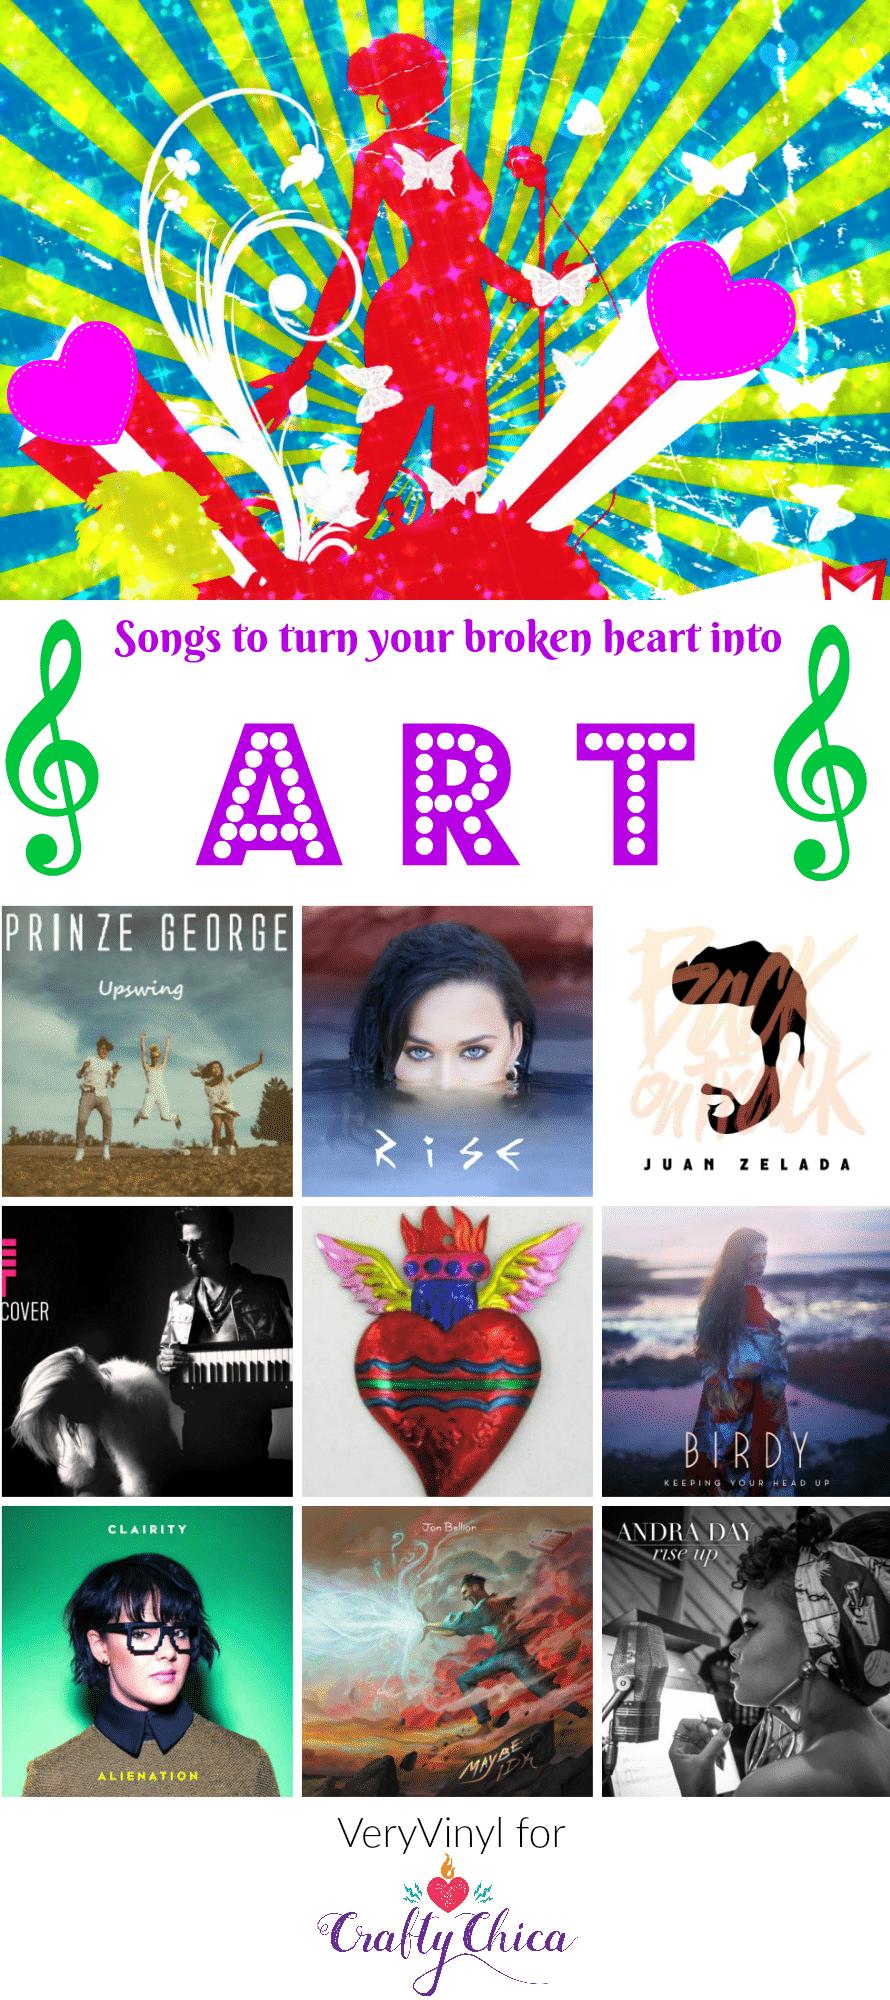 Songs to turn your broken